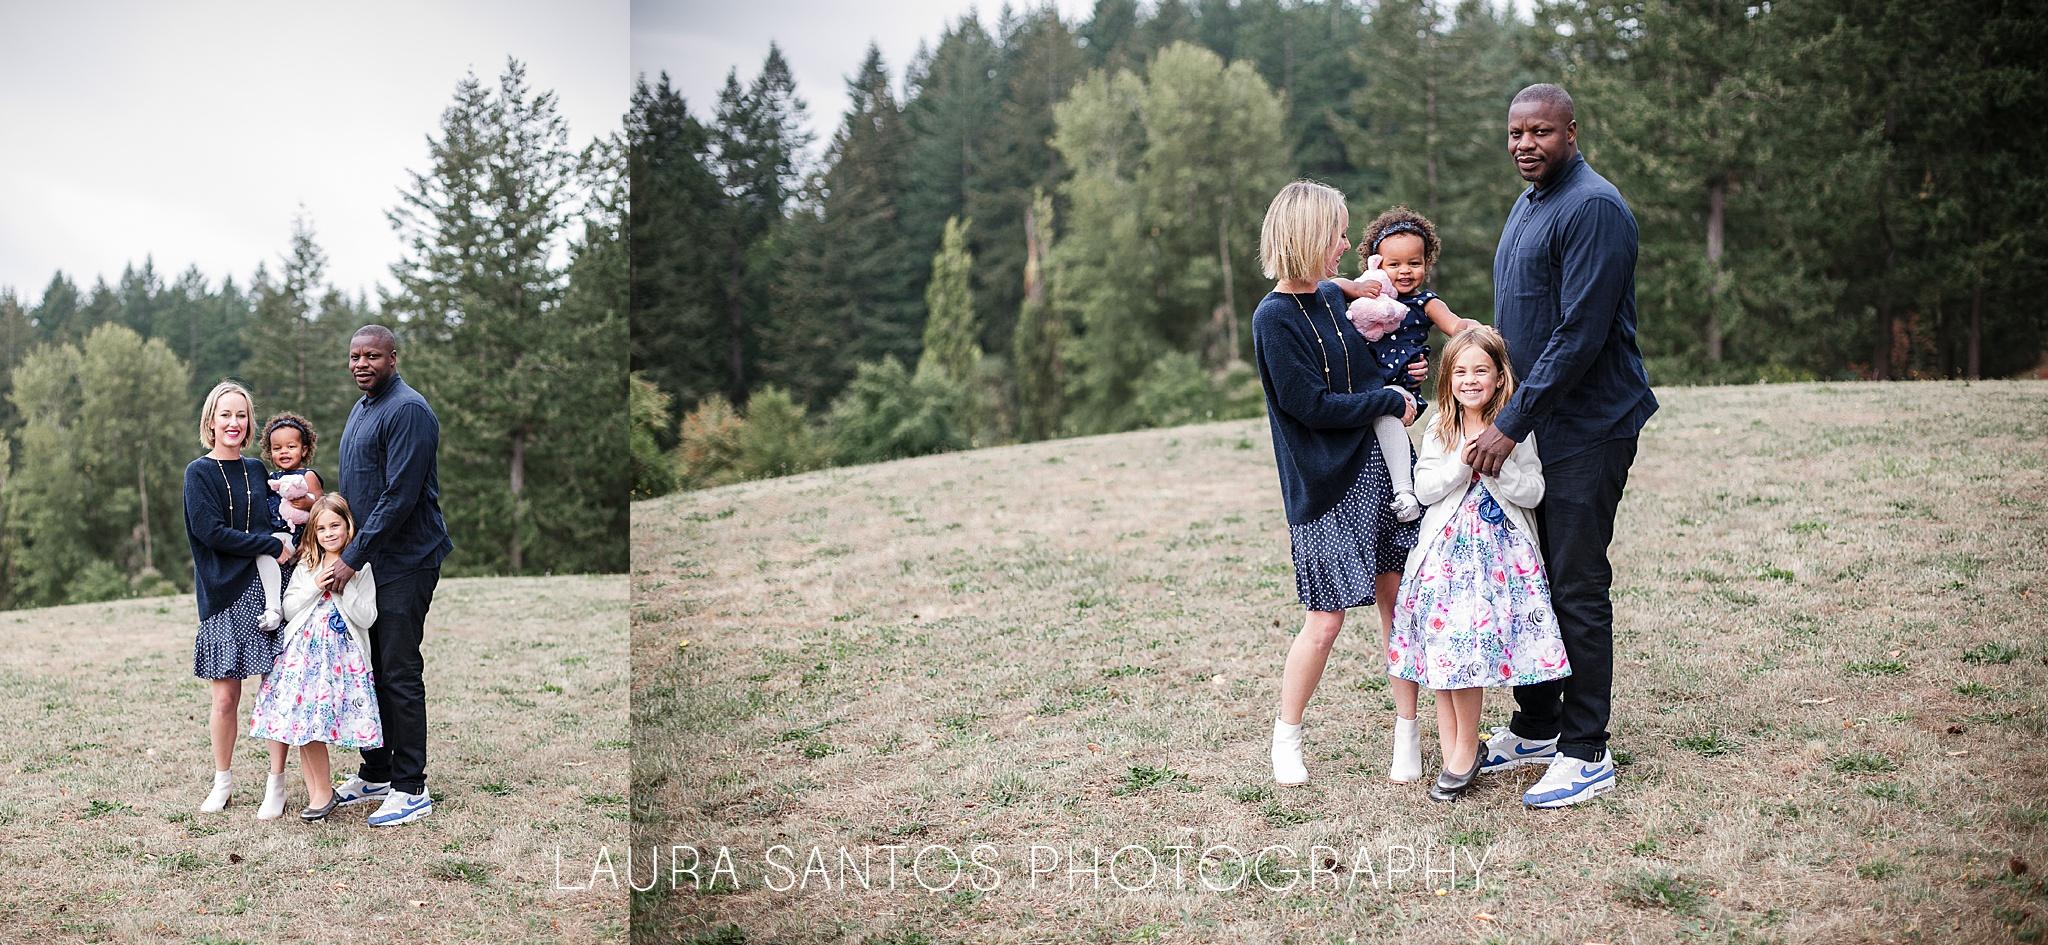 Laura Santos Photography Portland Oregon Family Photographer_0700.jpg